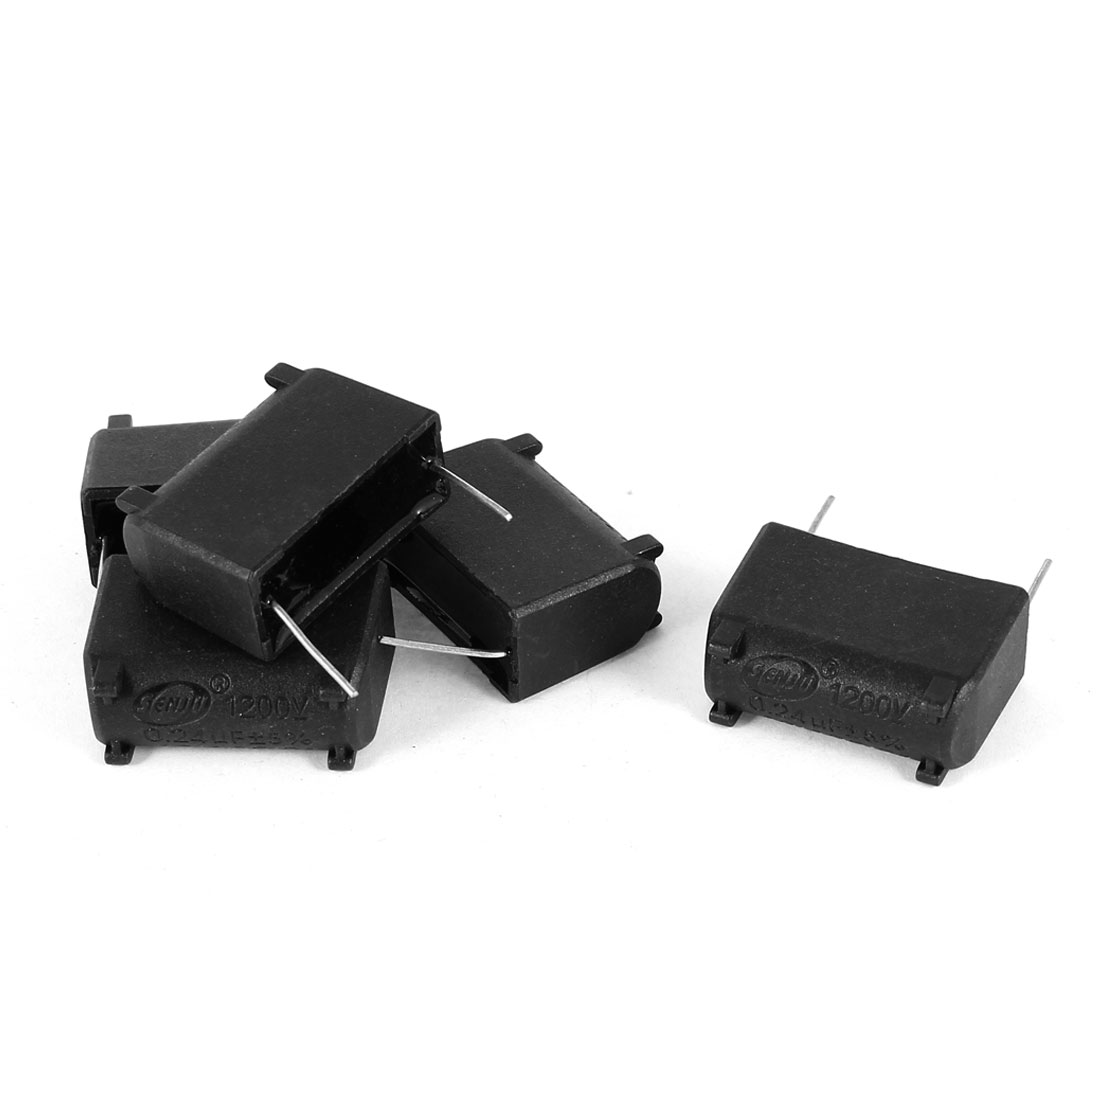 1200V 0.24uF 2Pins Polypropylene Film Capacitors 5 Pcs for Home Induction Cooker